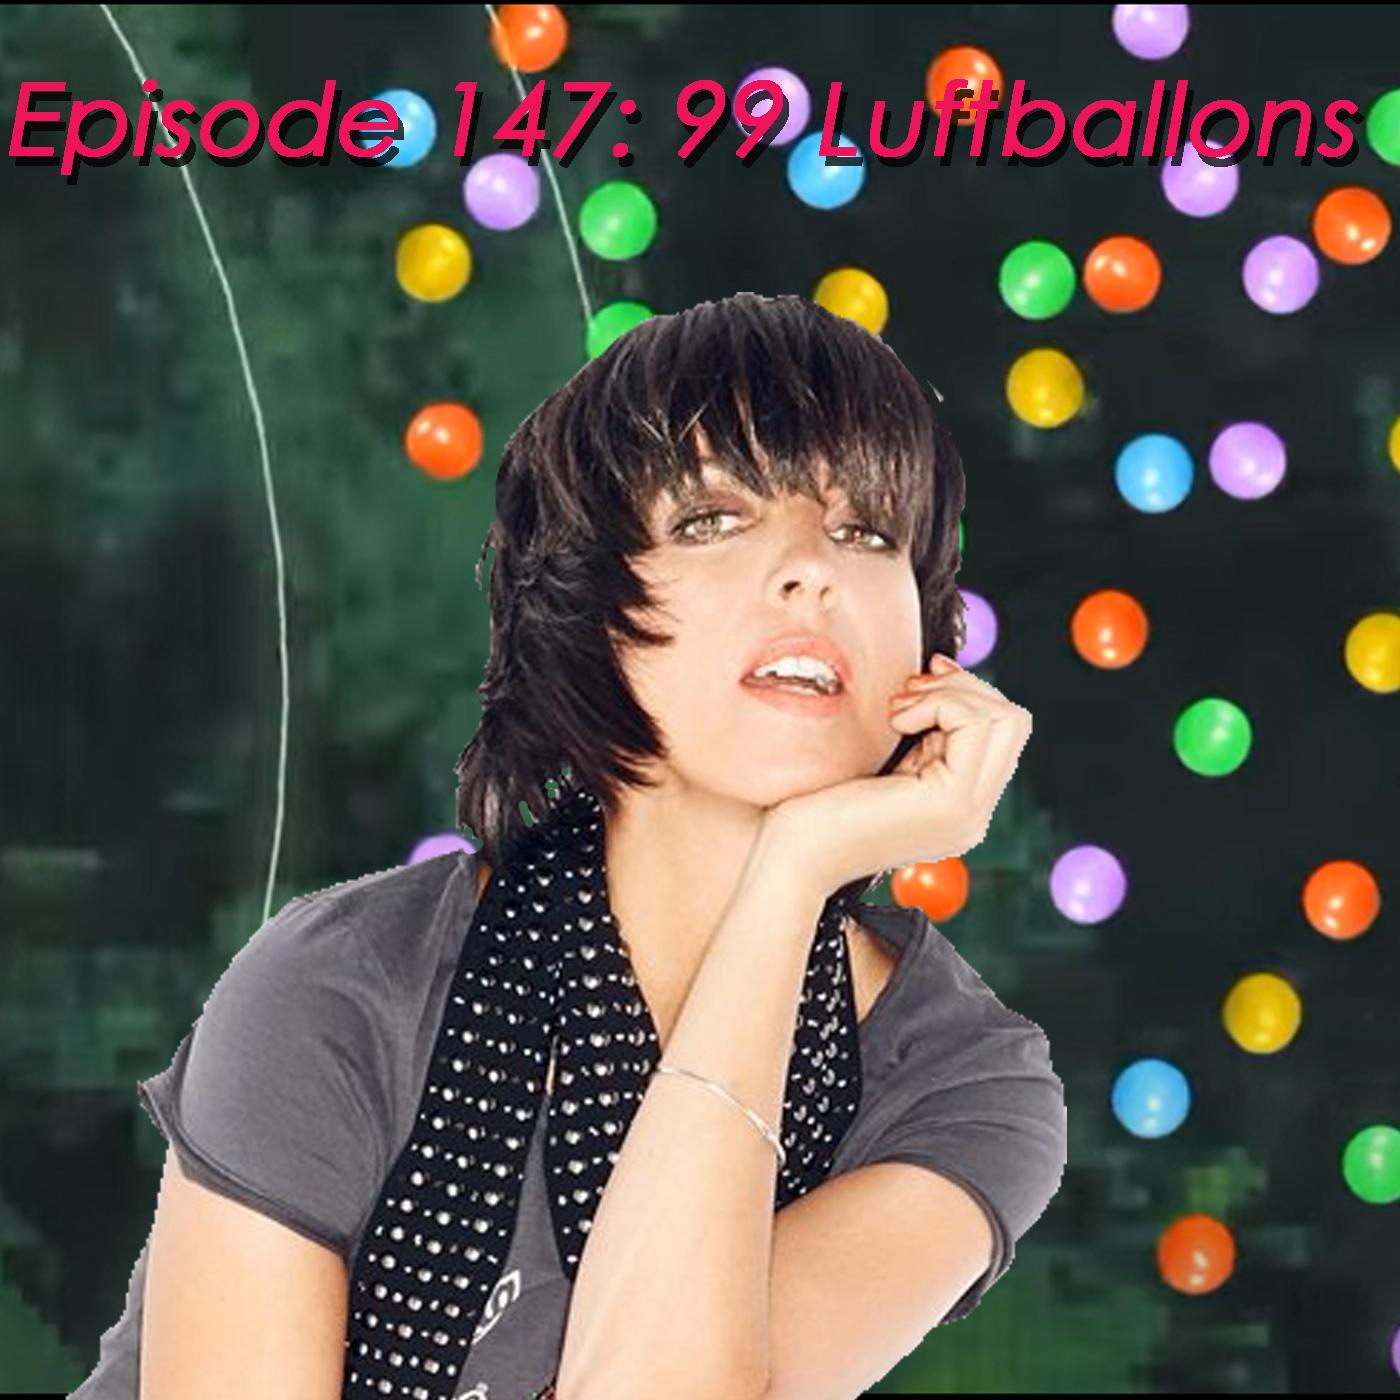 147: 99 Luftballons